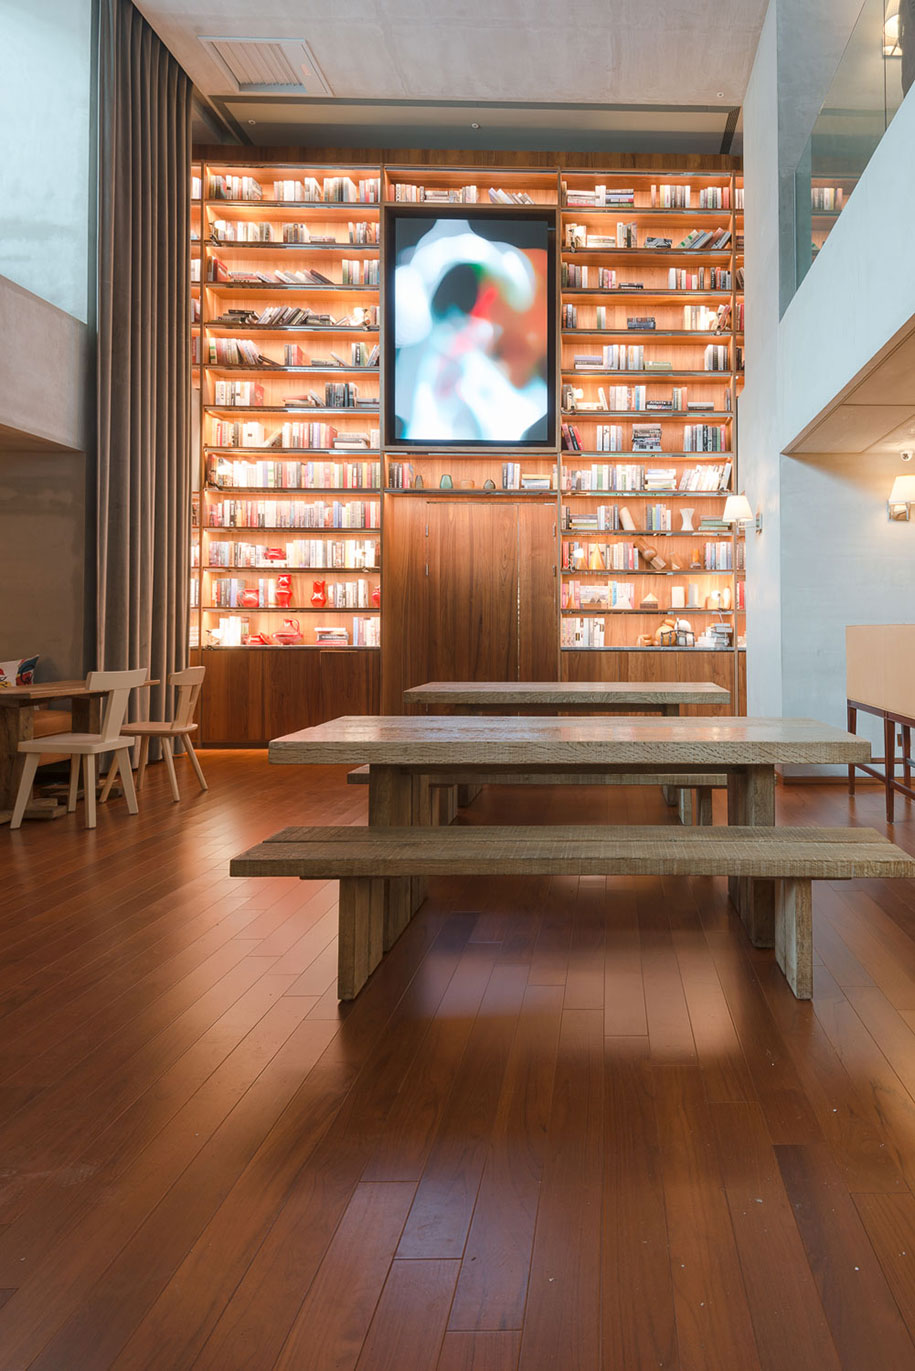 S Hotel Phillipe Stark bookshelf